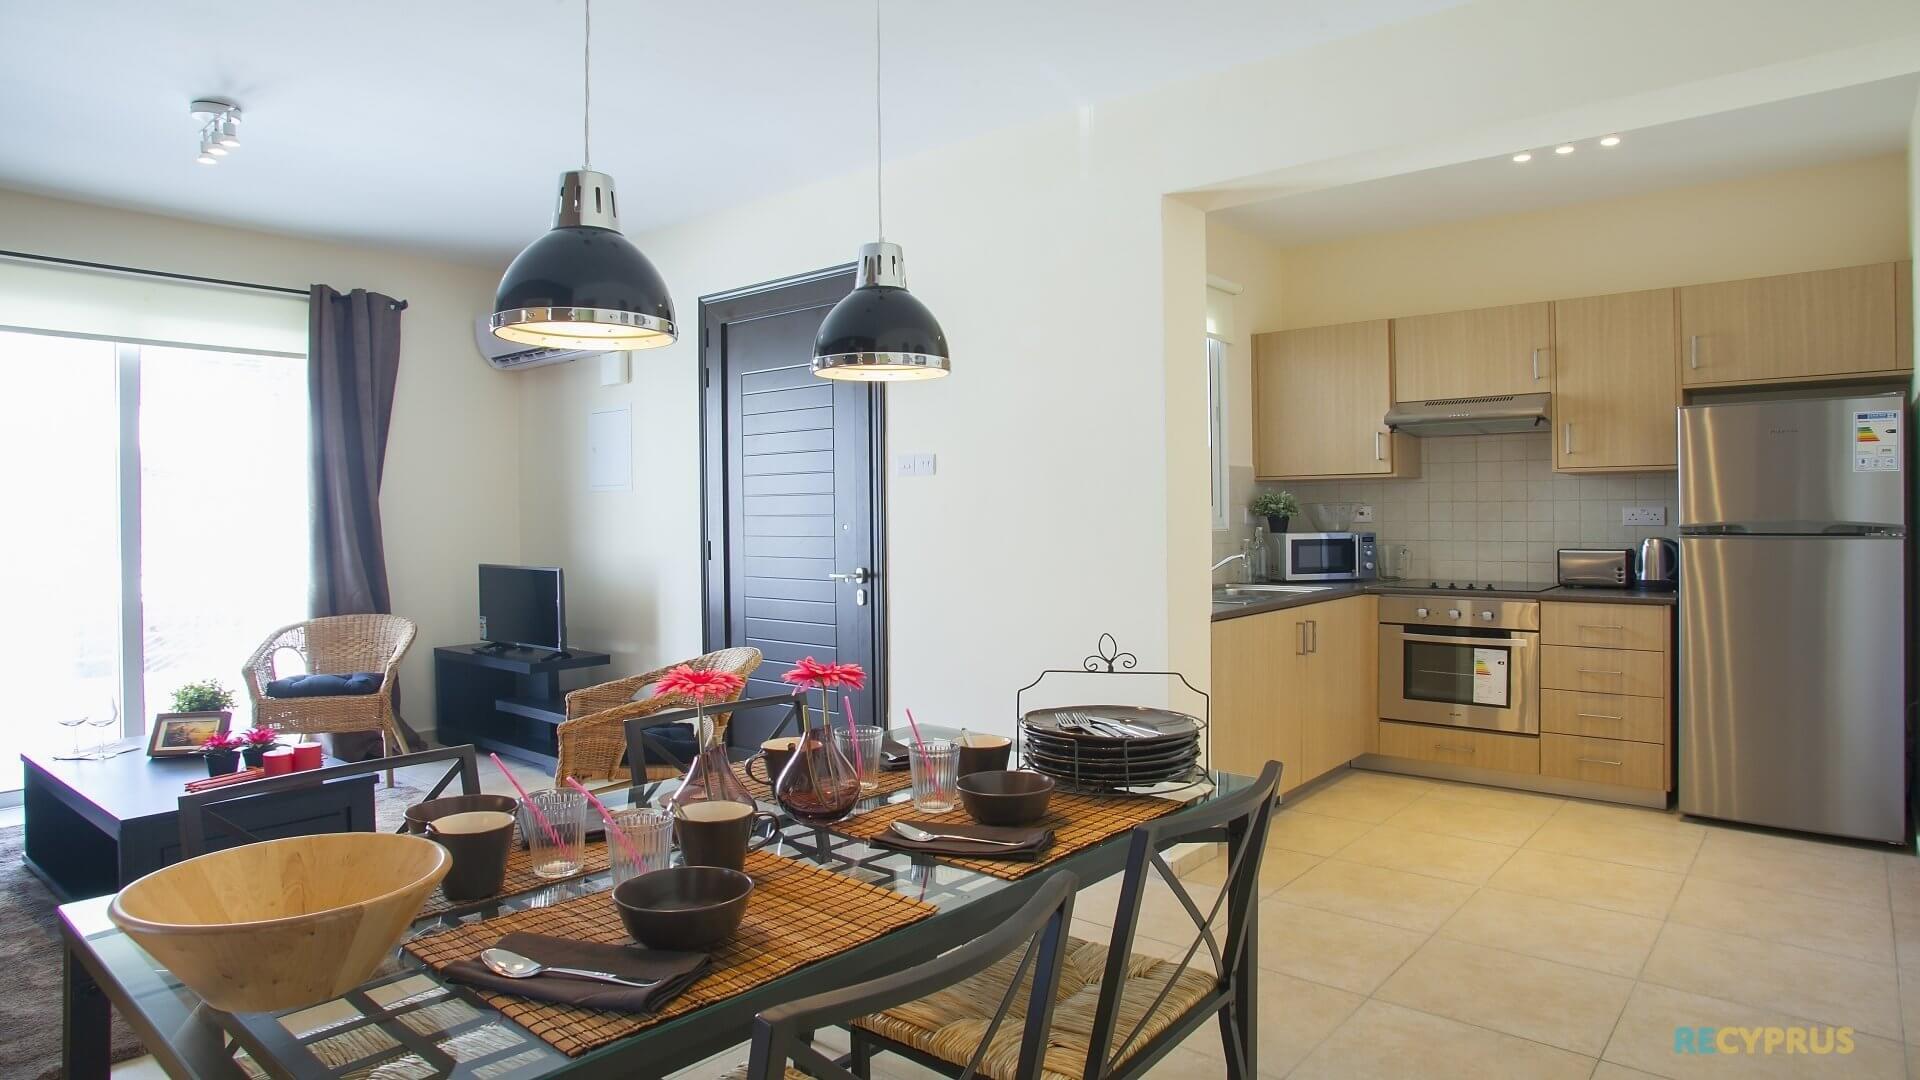 Apartment for sale Kapparis Famagusta Cyprus 3 3442